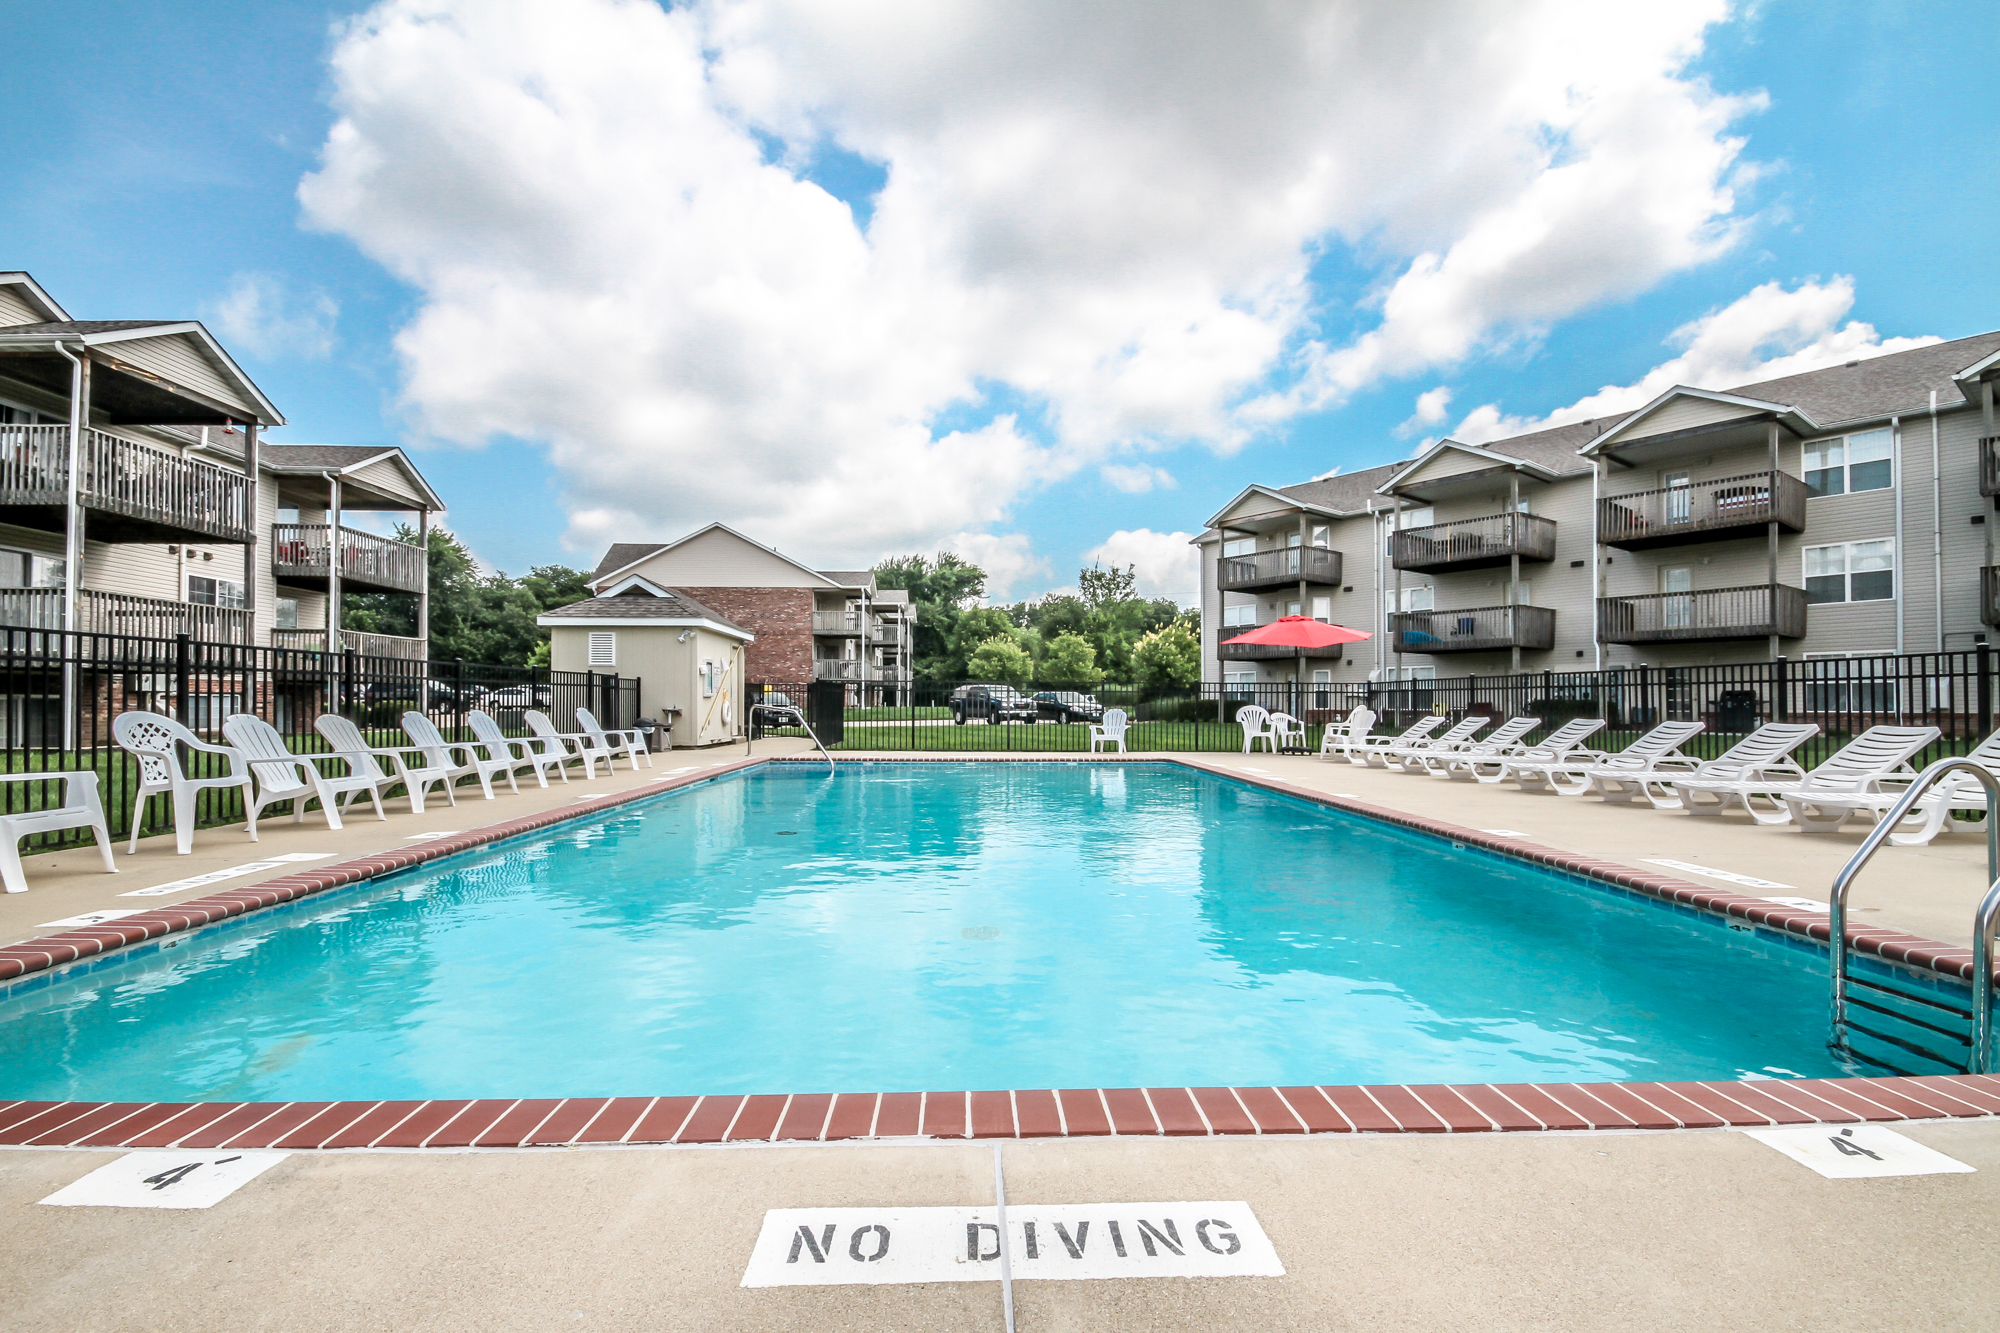 Brookside-Apartments-O'Fallon-Illinois-Pool-4.jpg